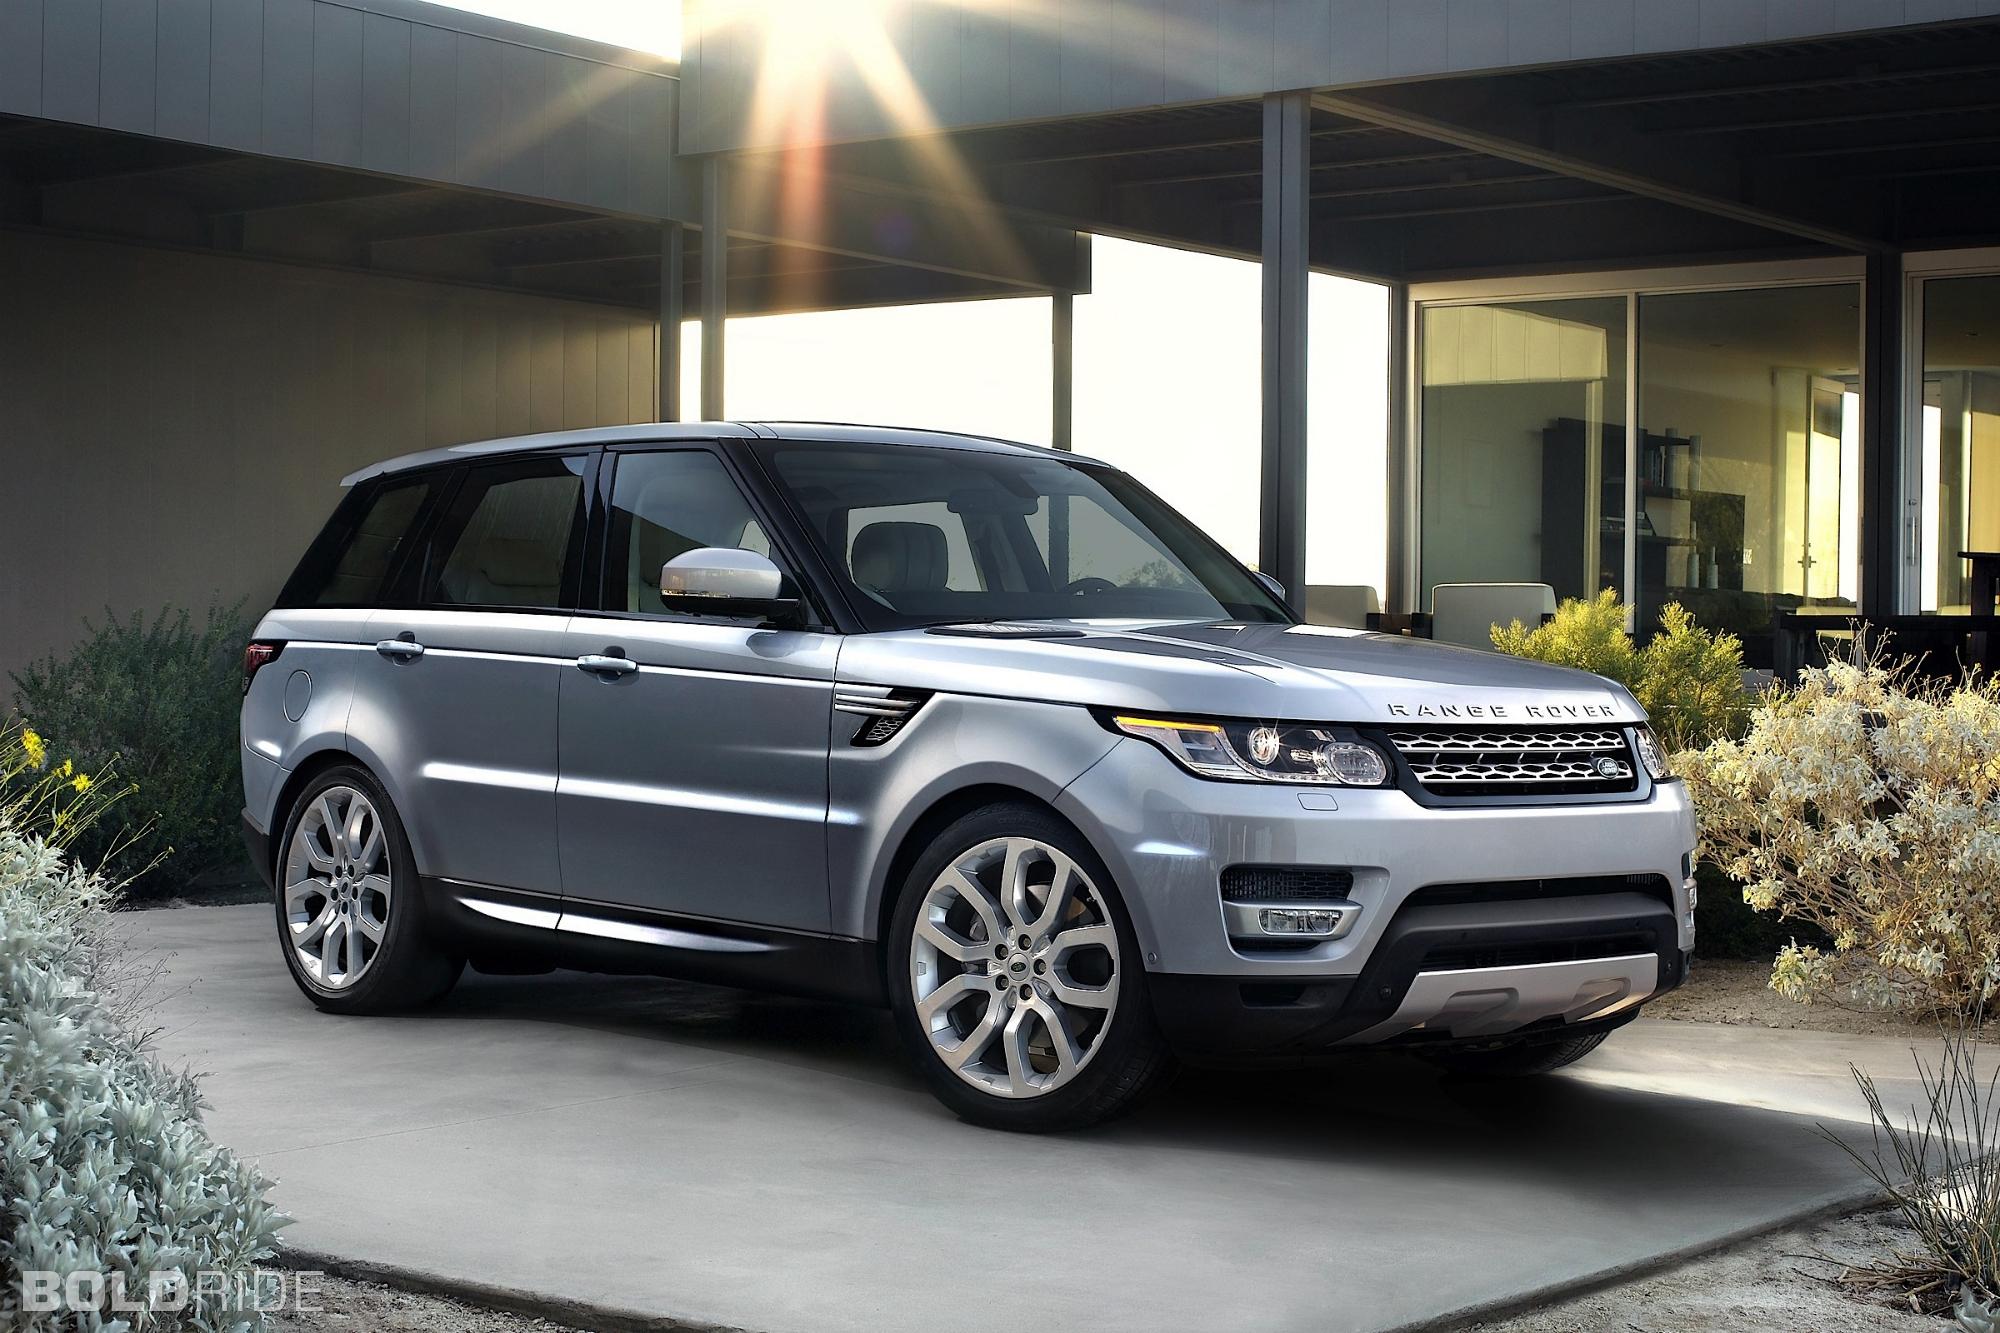 2014 Land Rover Range Rover Sport 1920 x 1080